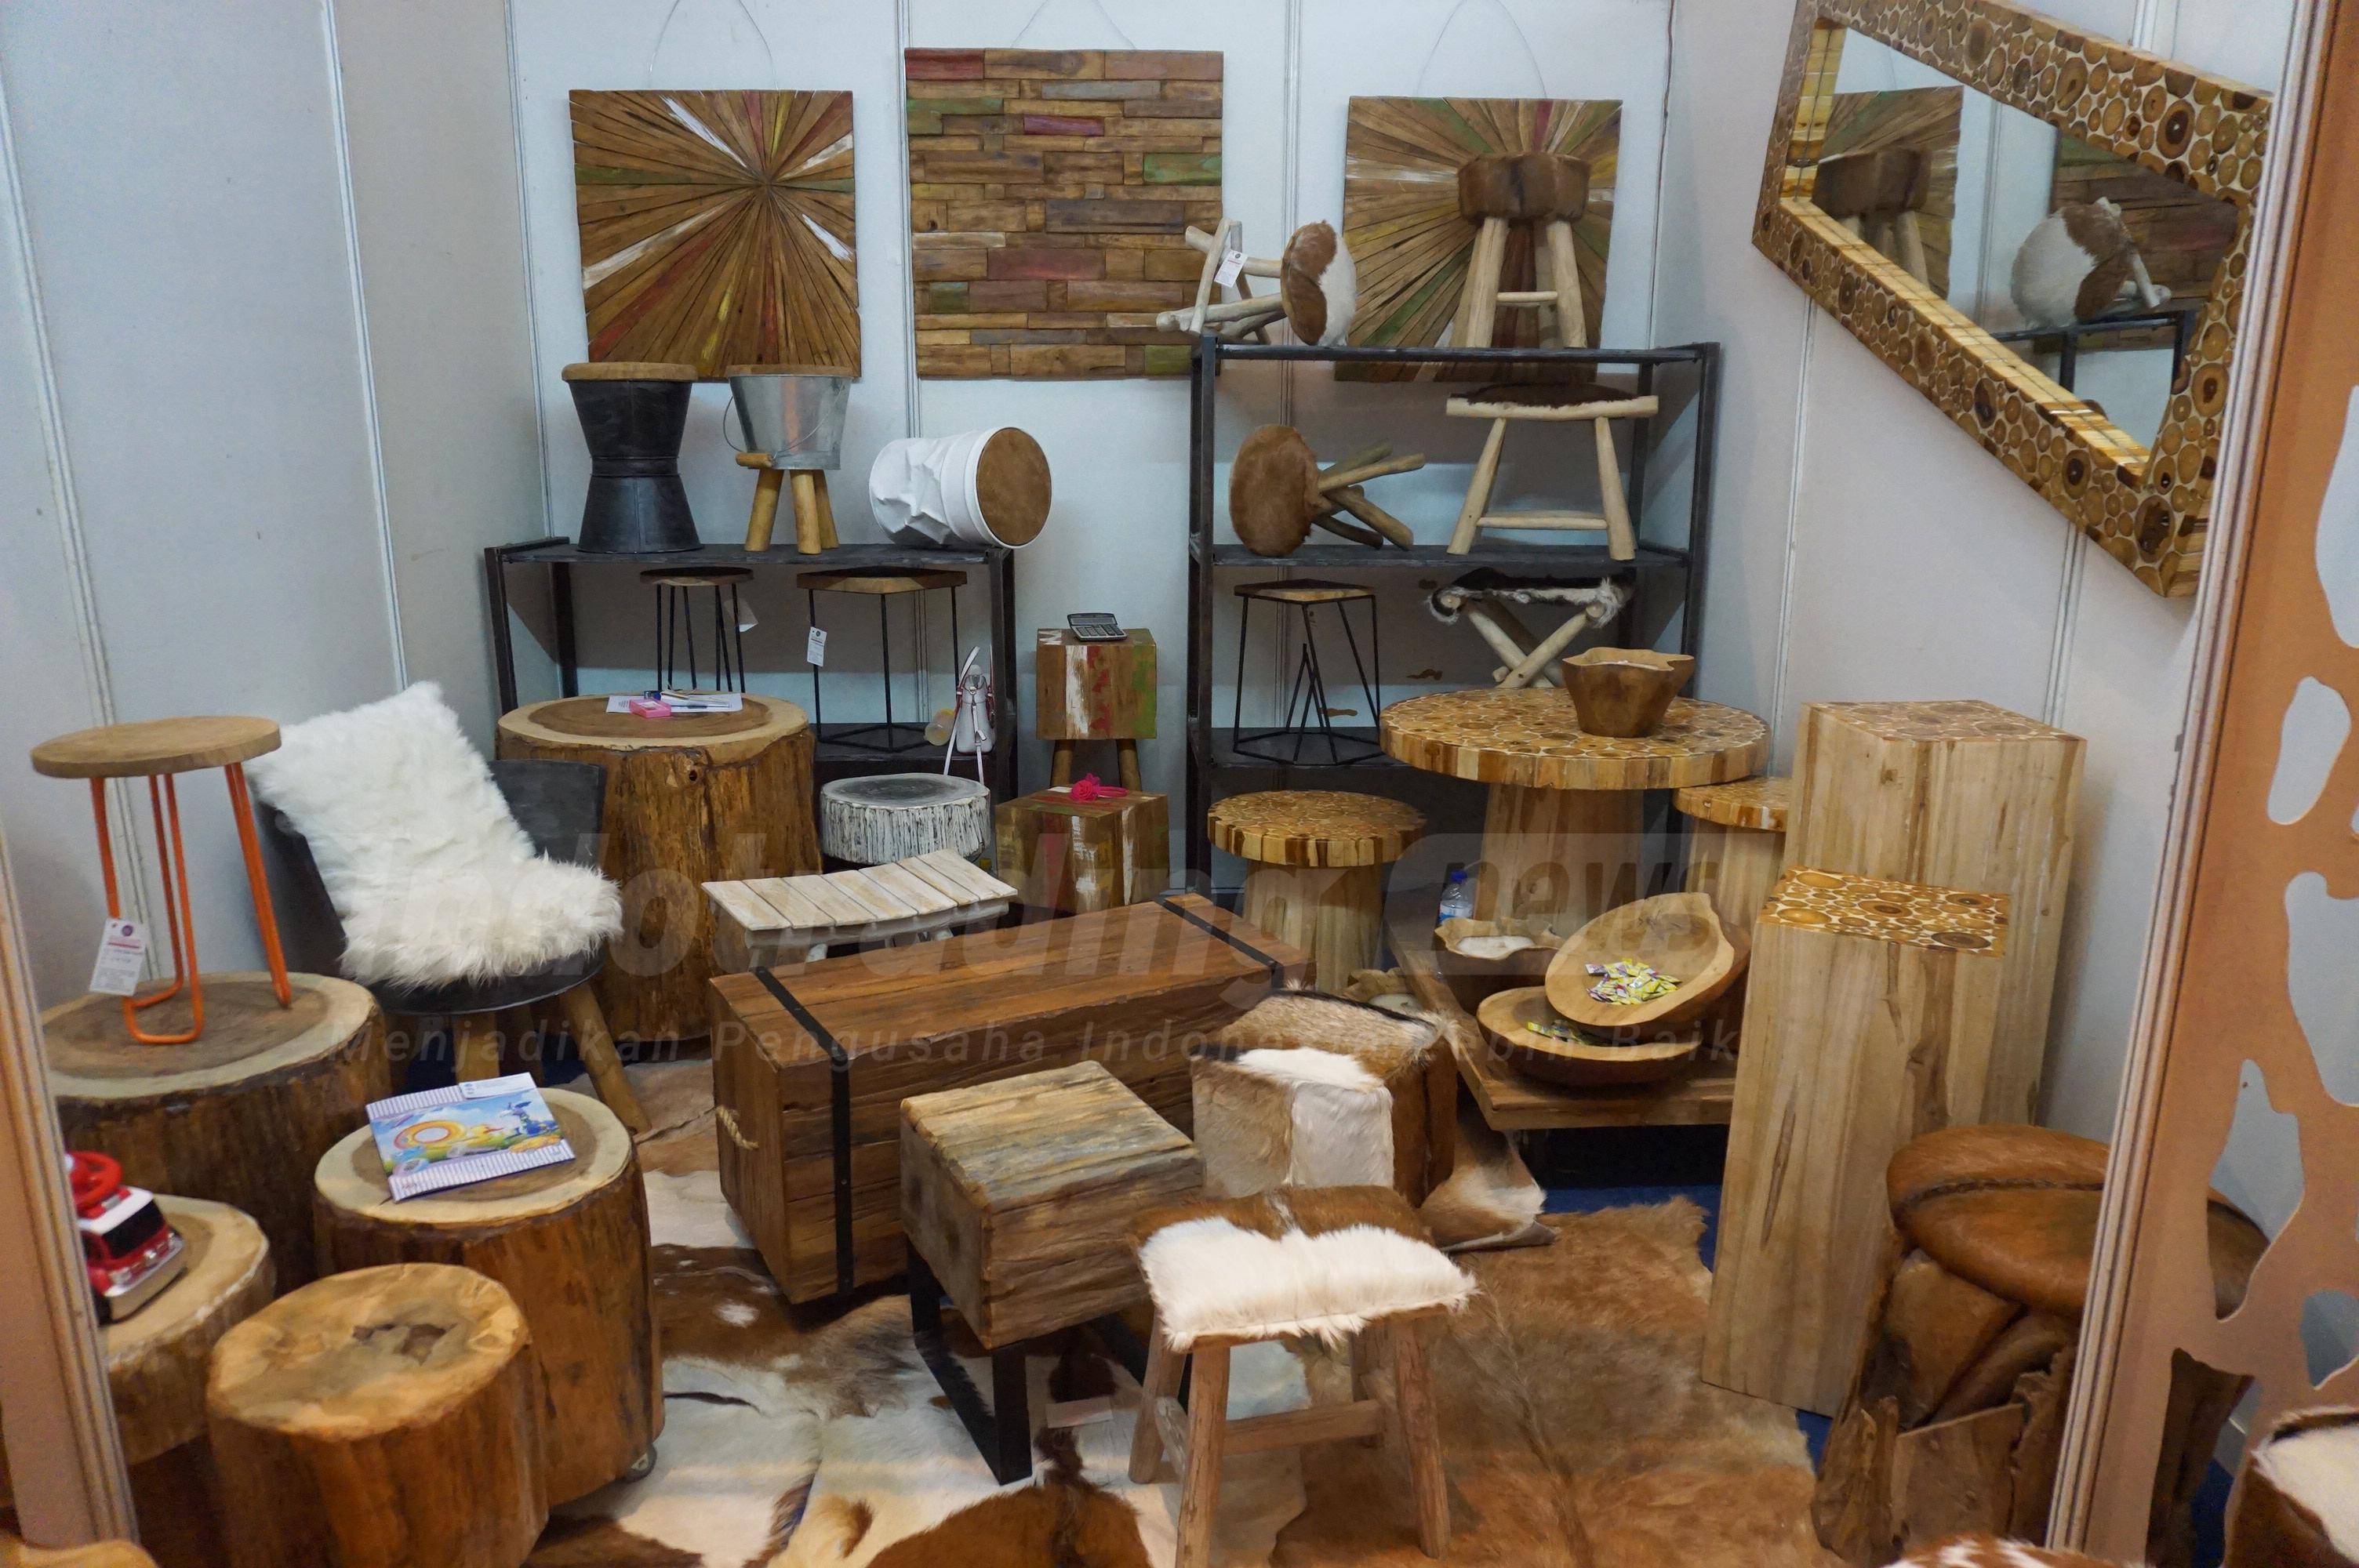 foto furniture. foto: berbagai produk buatan pangjati rustic furniture \u0026 crafts/dok: indotrading.com foto